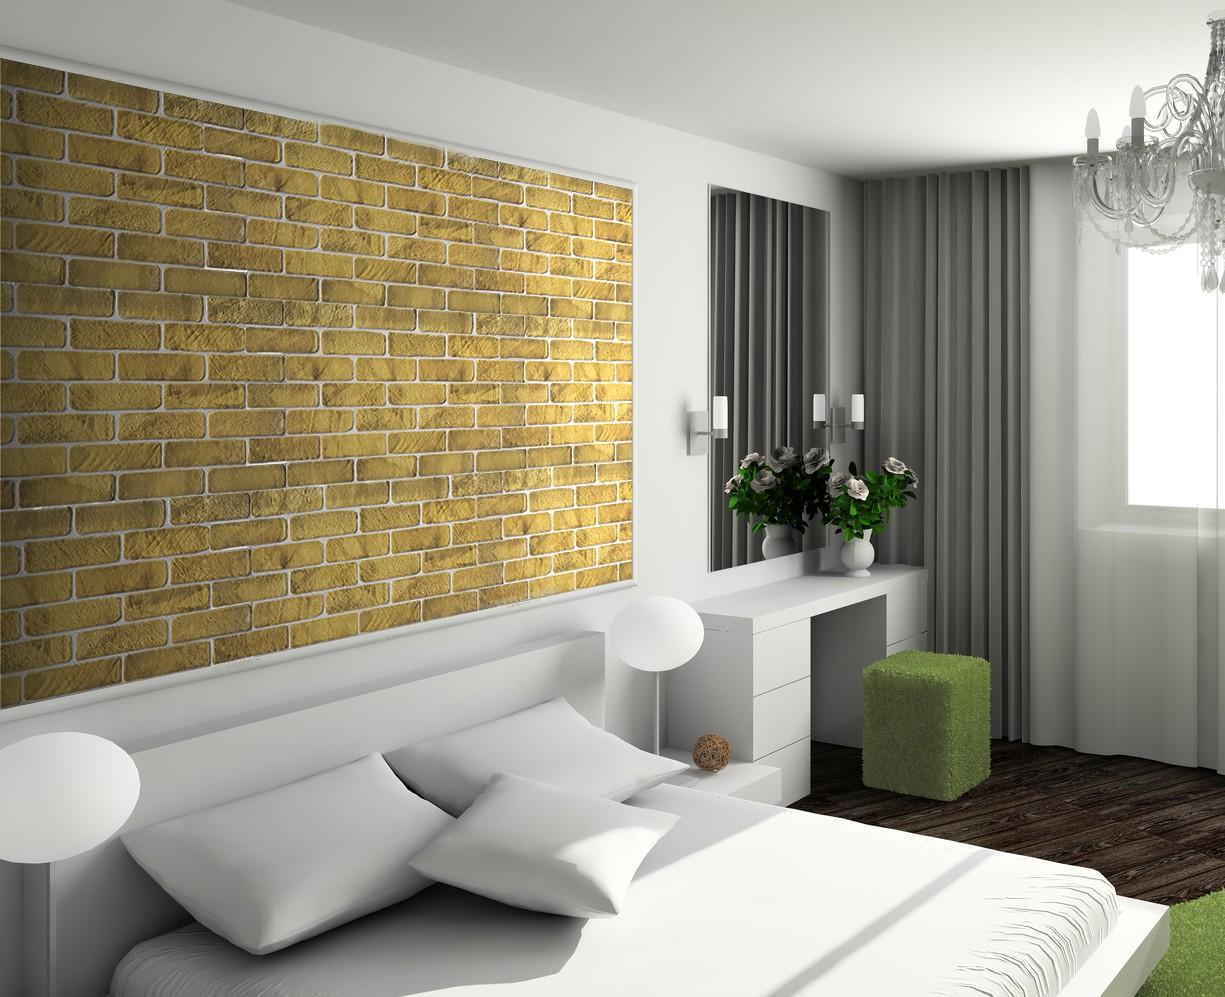 1 pvc dekorplatte mosaic wandverkleidung platten 95x48cm old brick yellow dekore aus pvc. Black Bedroom Furniture Sets. Home Design Ideas